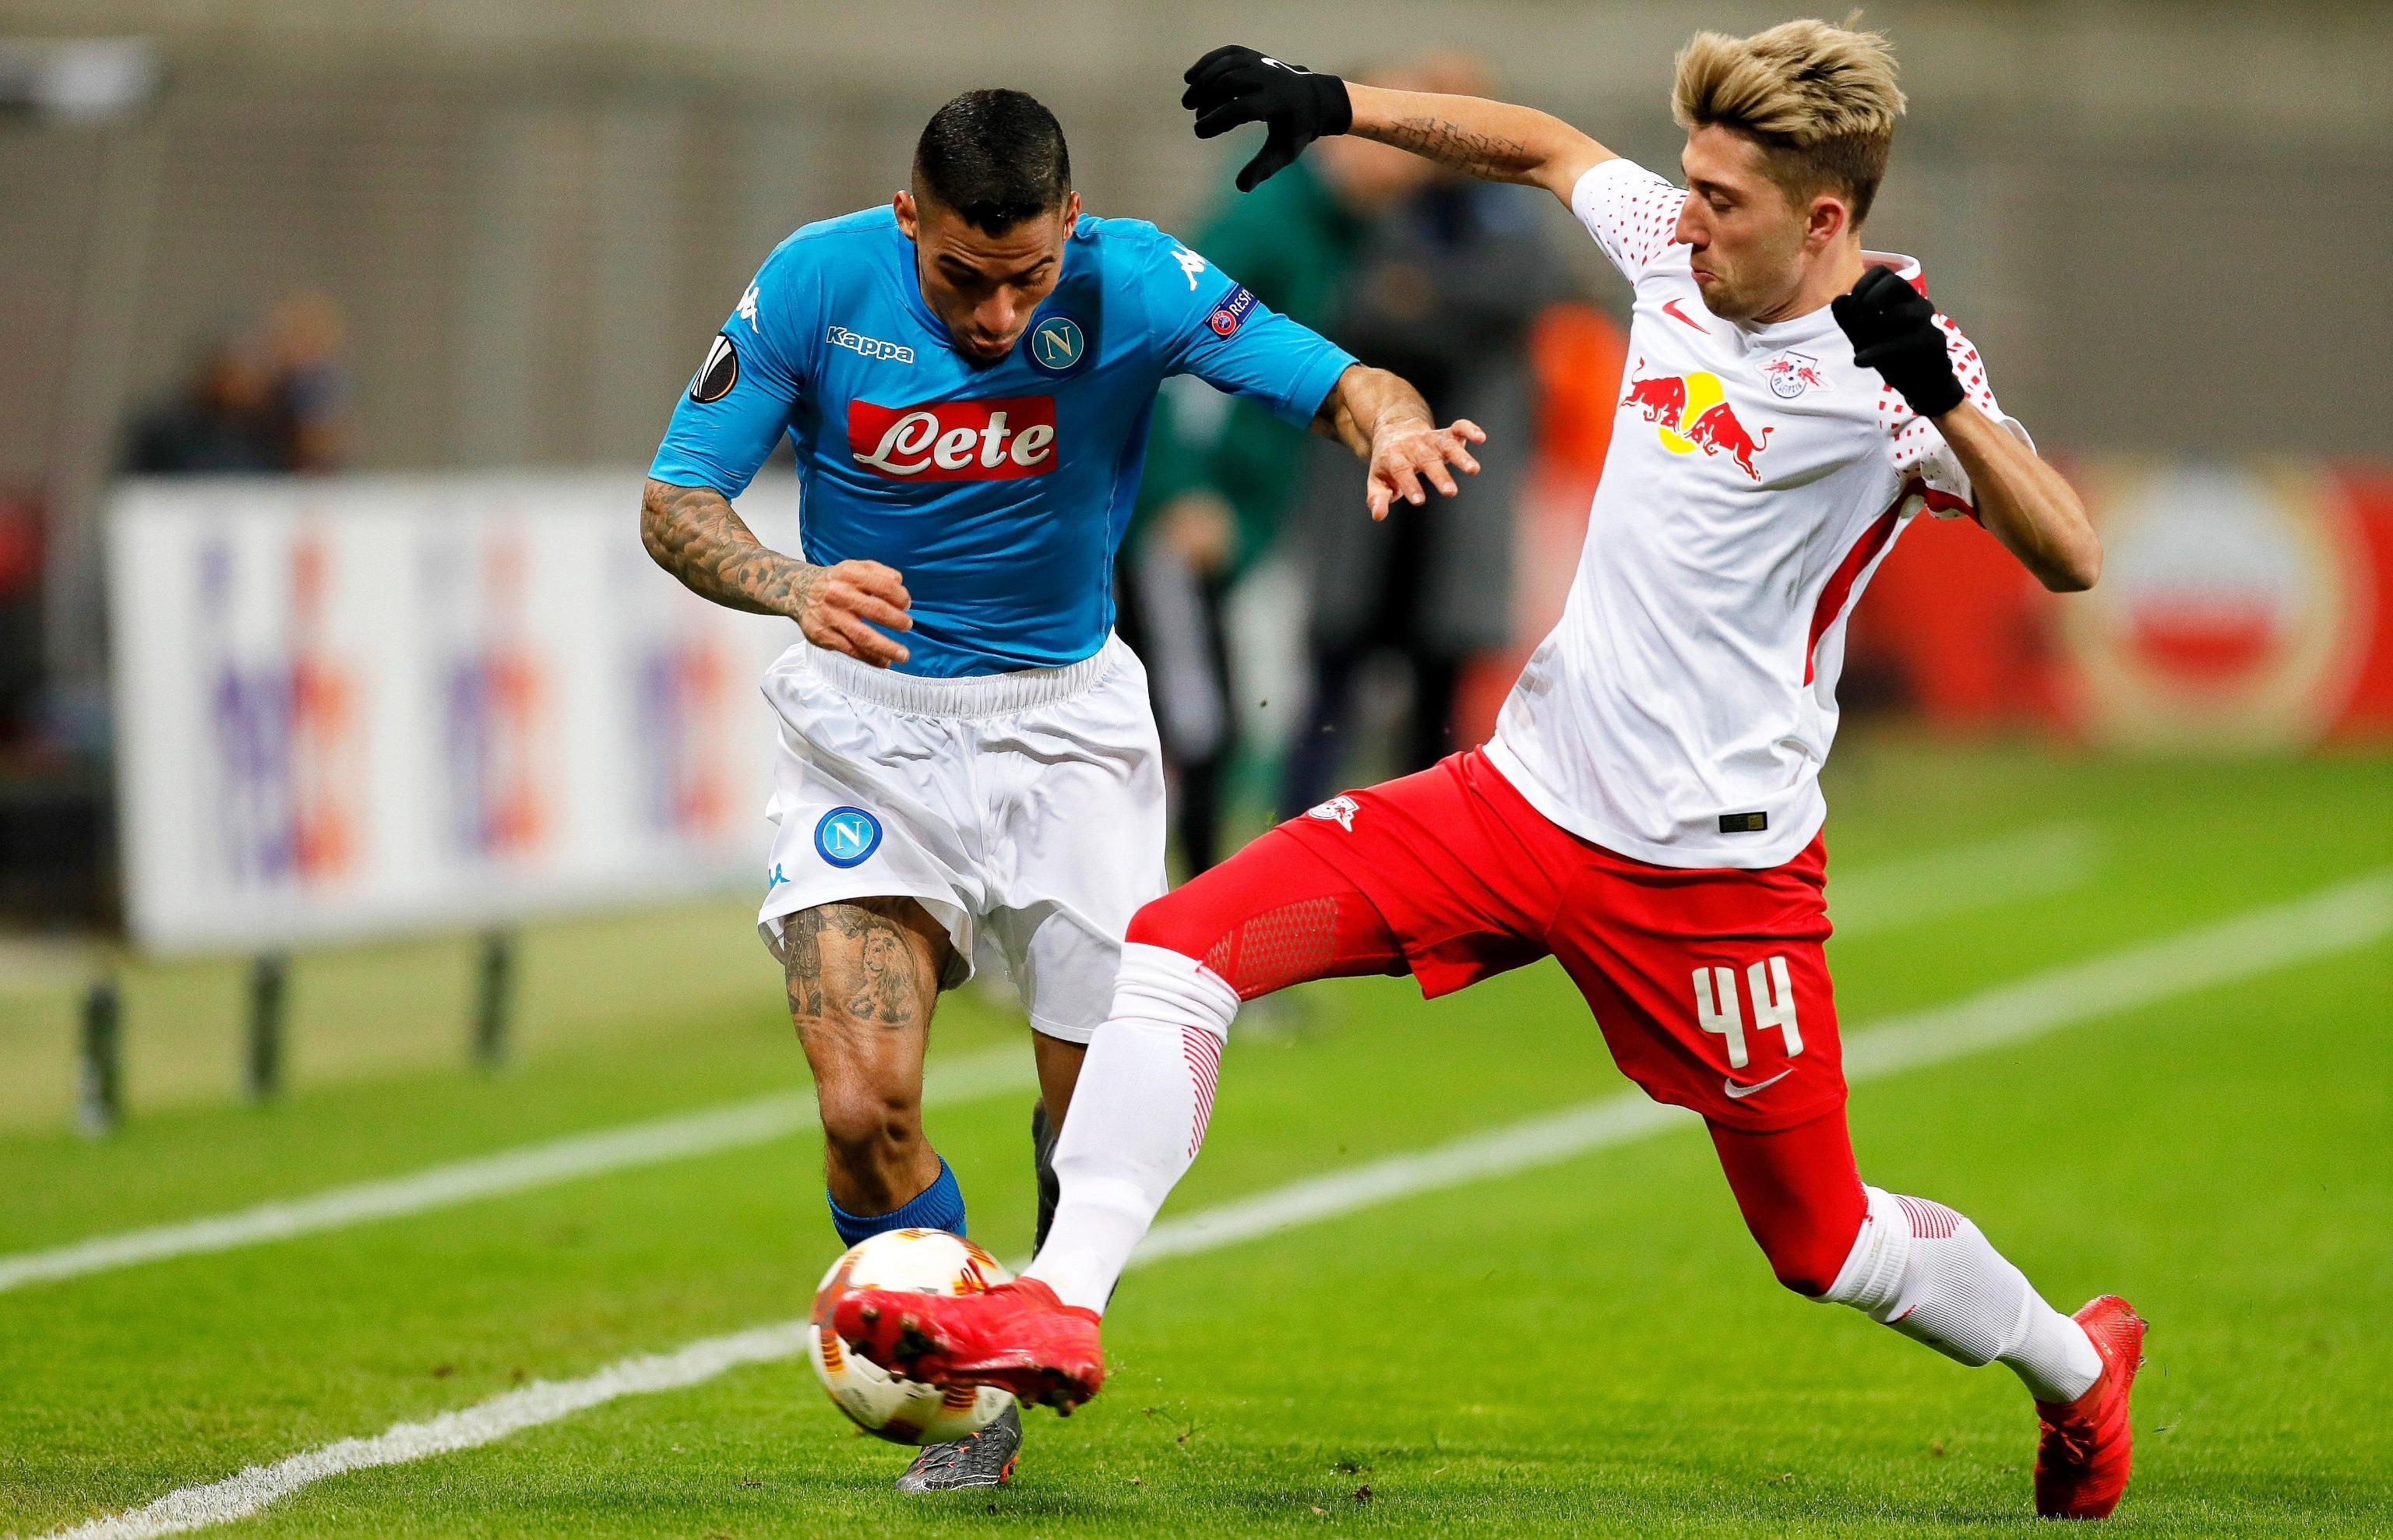 Europa League: Napoli, rimonta solo sfiorata